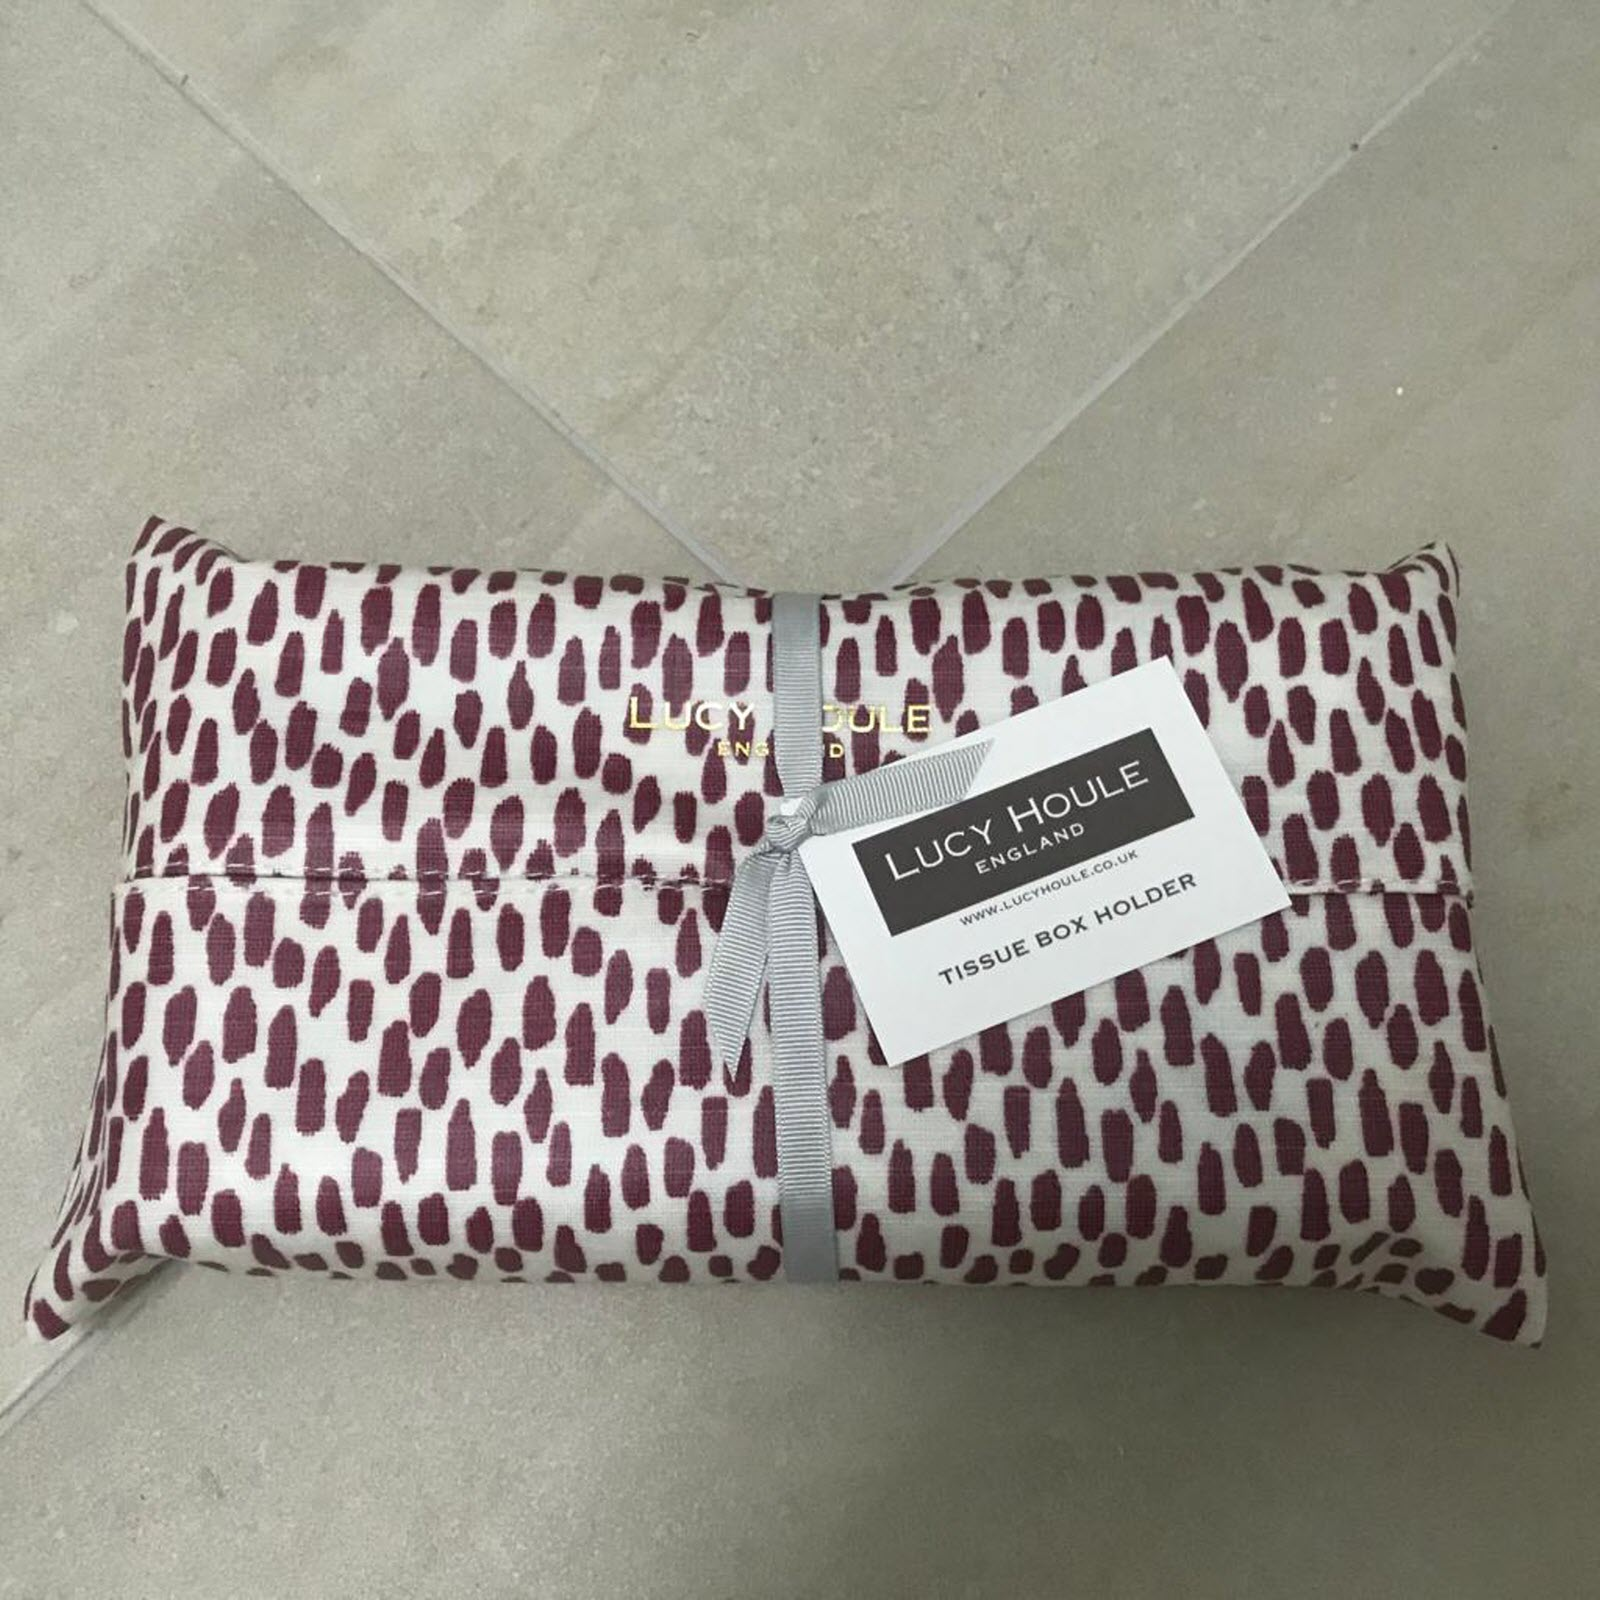 Mulberry Cobblestone Tissue Box Holder